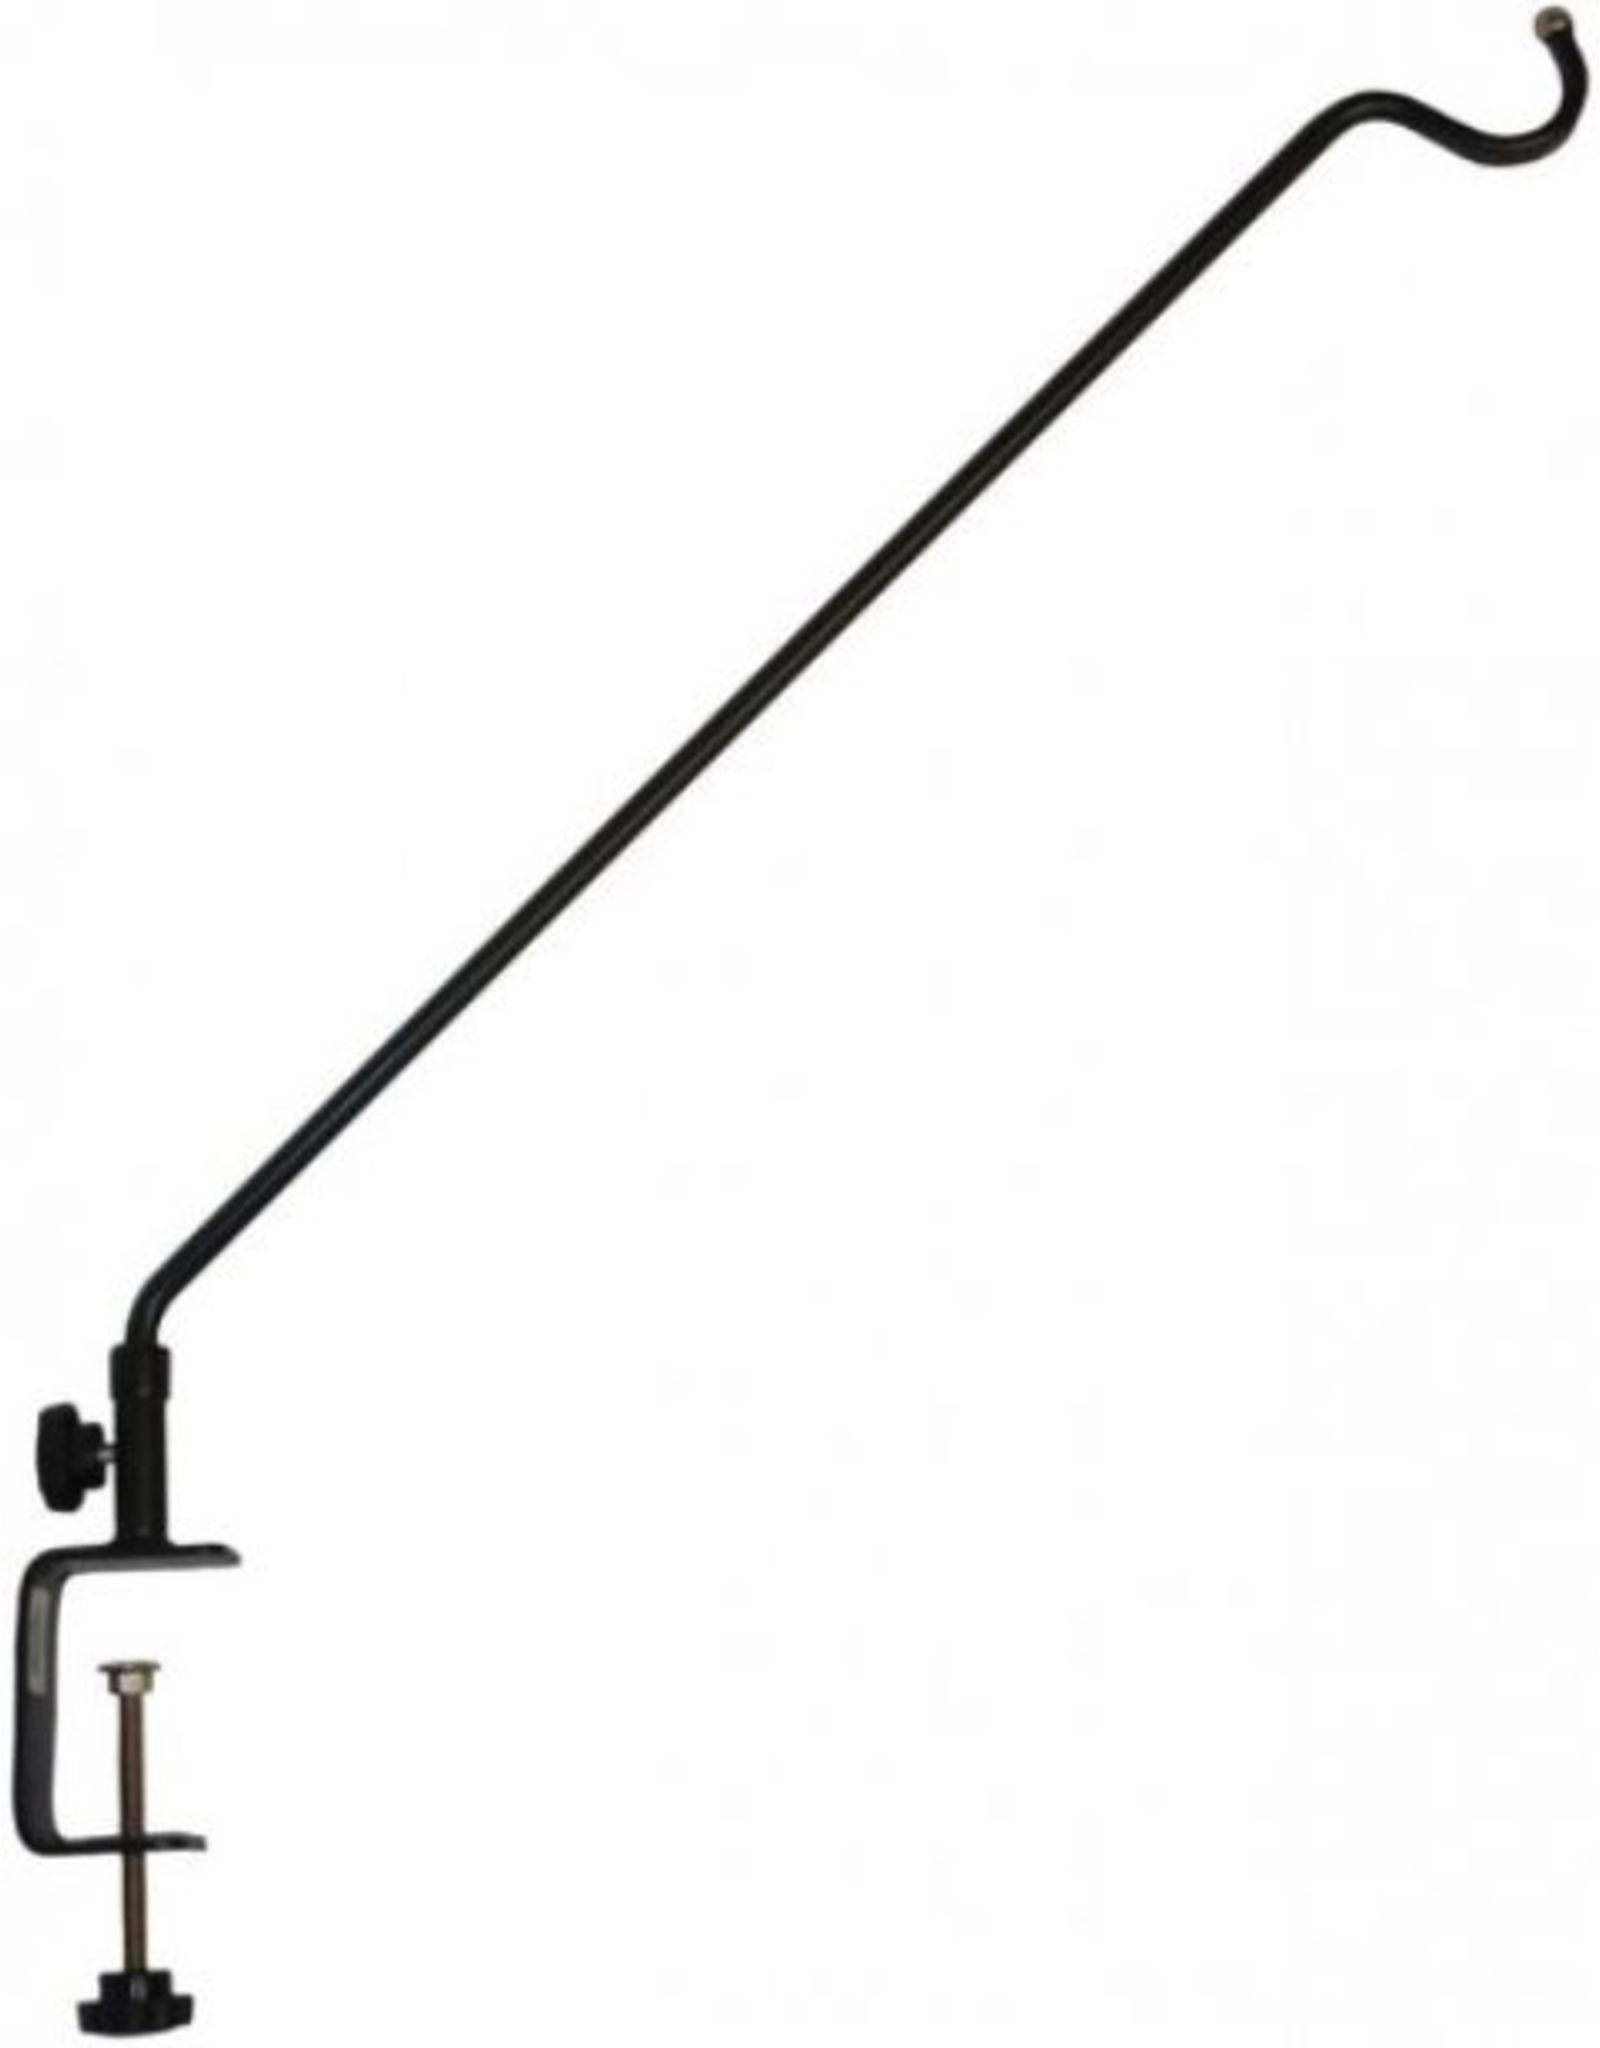 "Erva ETSRB3CL Swing Arm  w/clamp-37"" REACH"